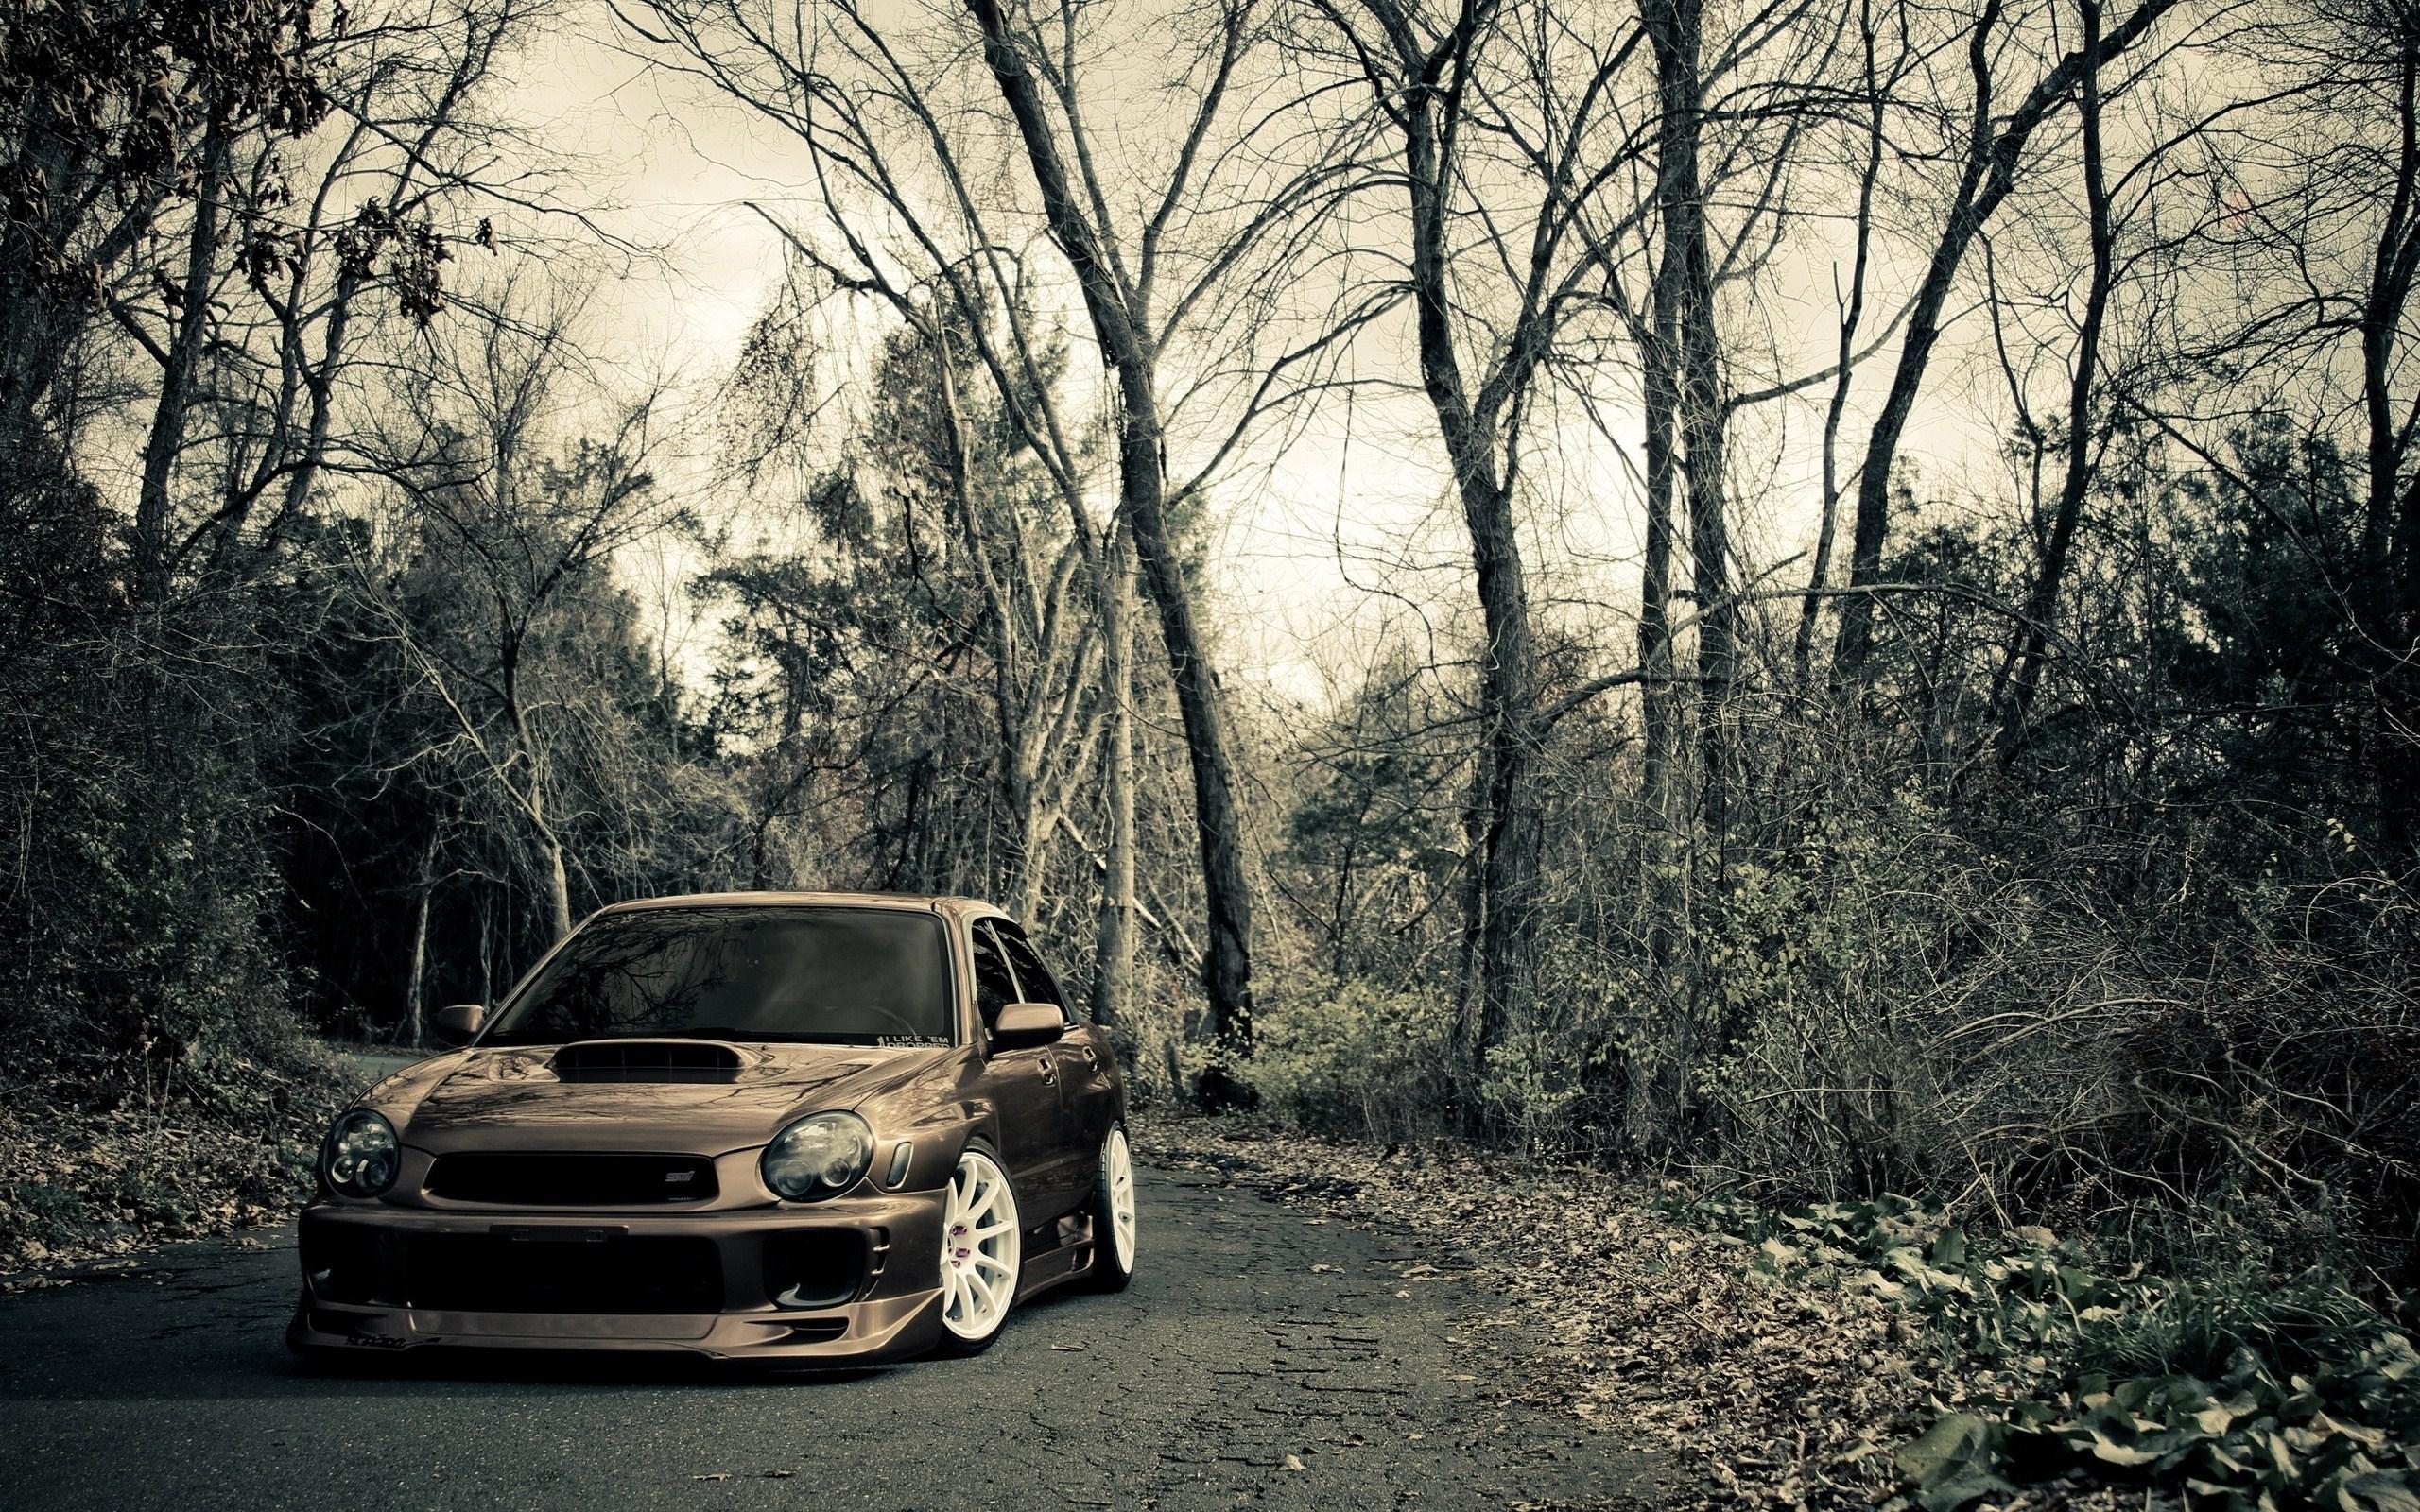 Road Forest Subaru Impreza